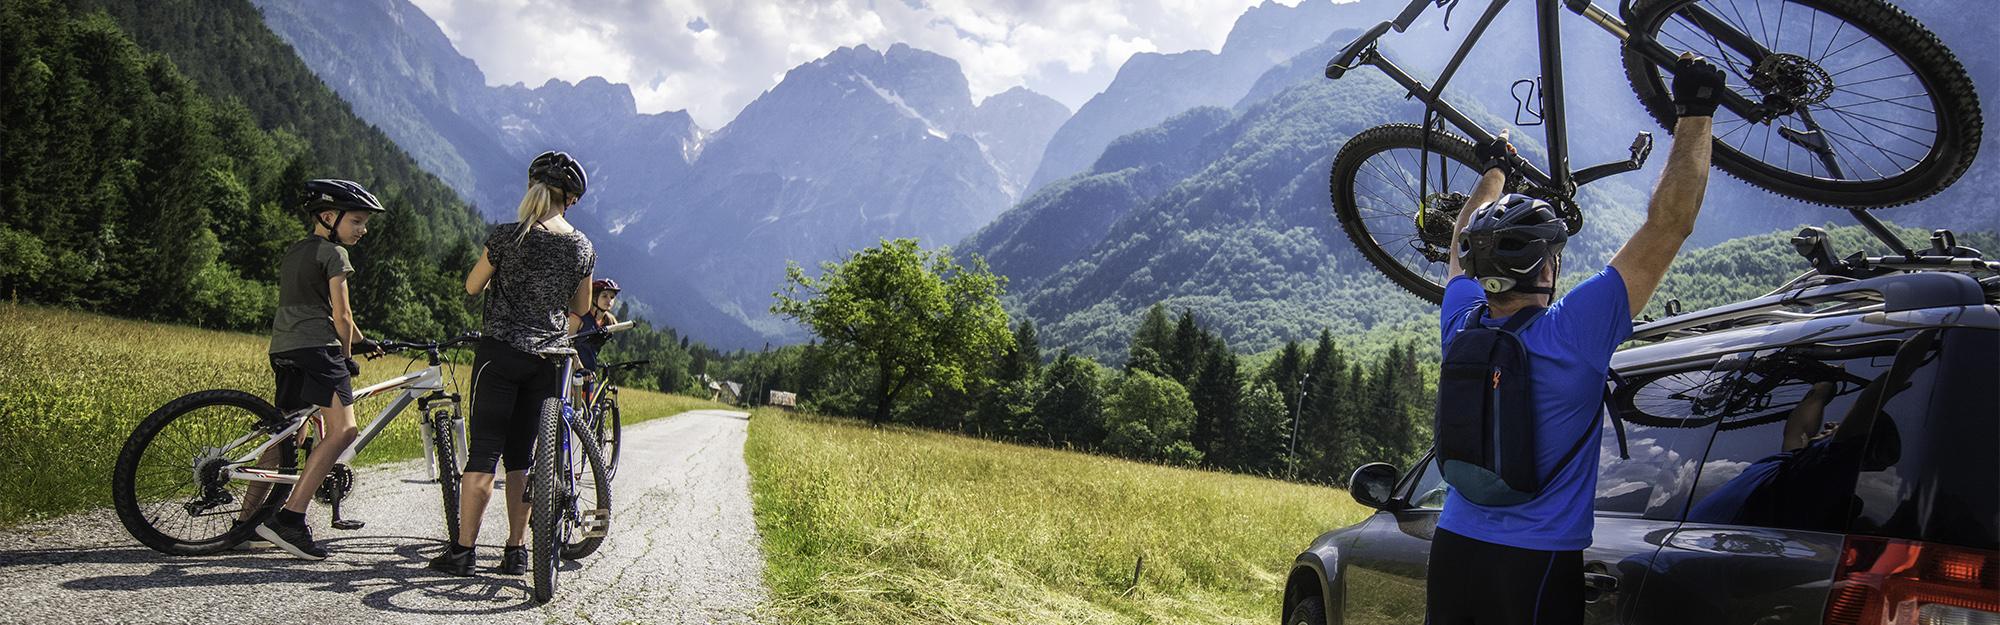 bikers-on-mountain-road-banner.jpg